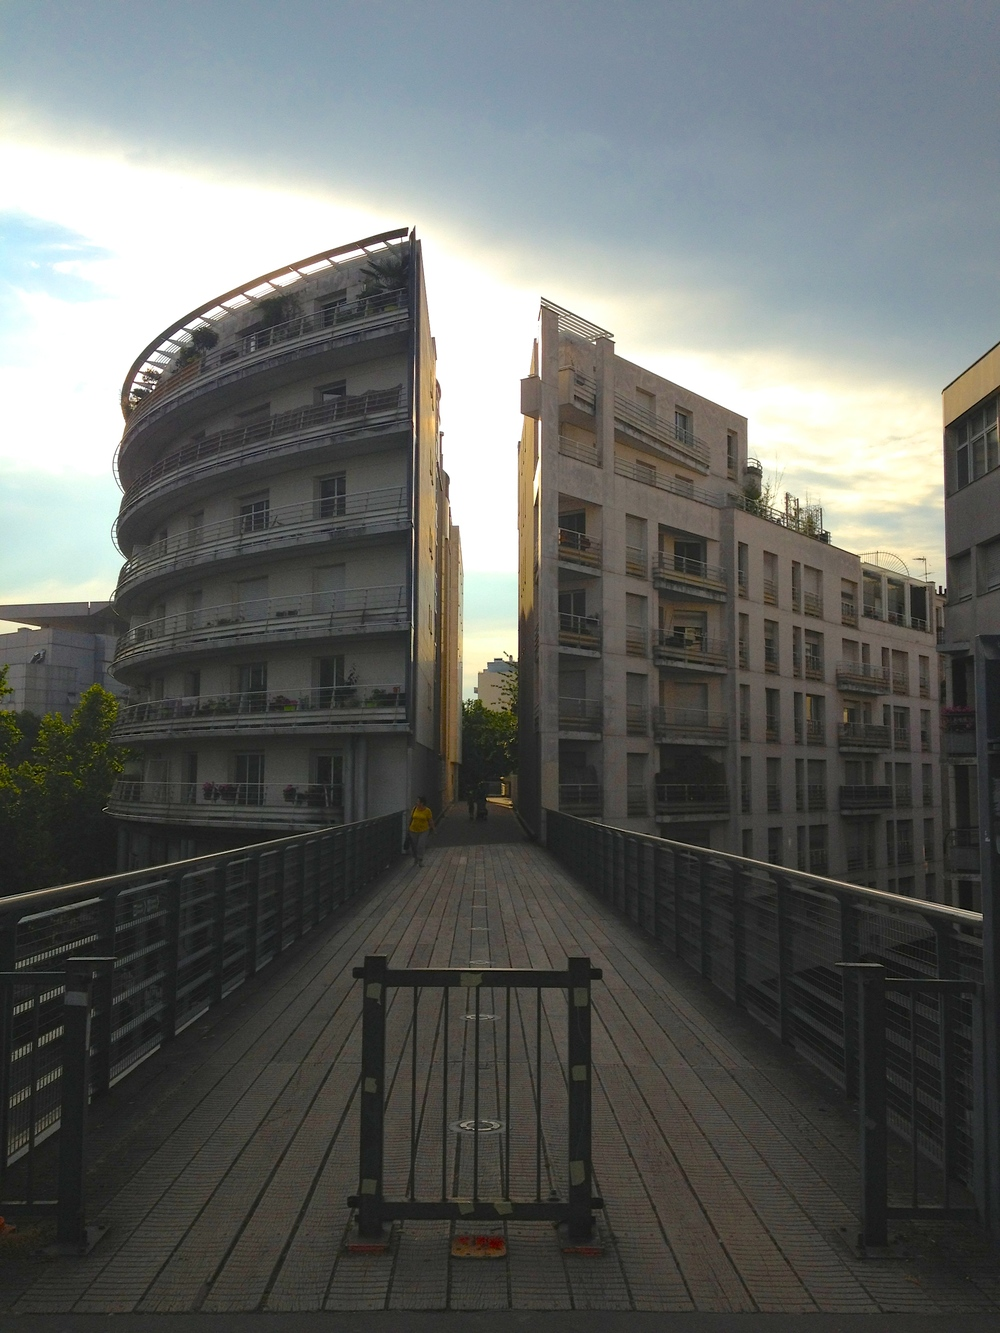 Viaduc des Arts, Paris